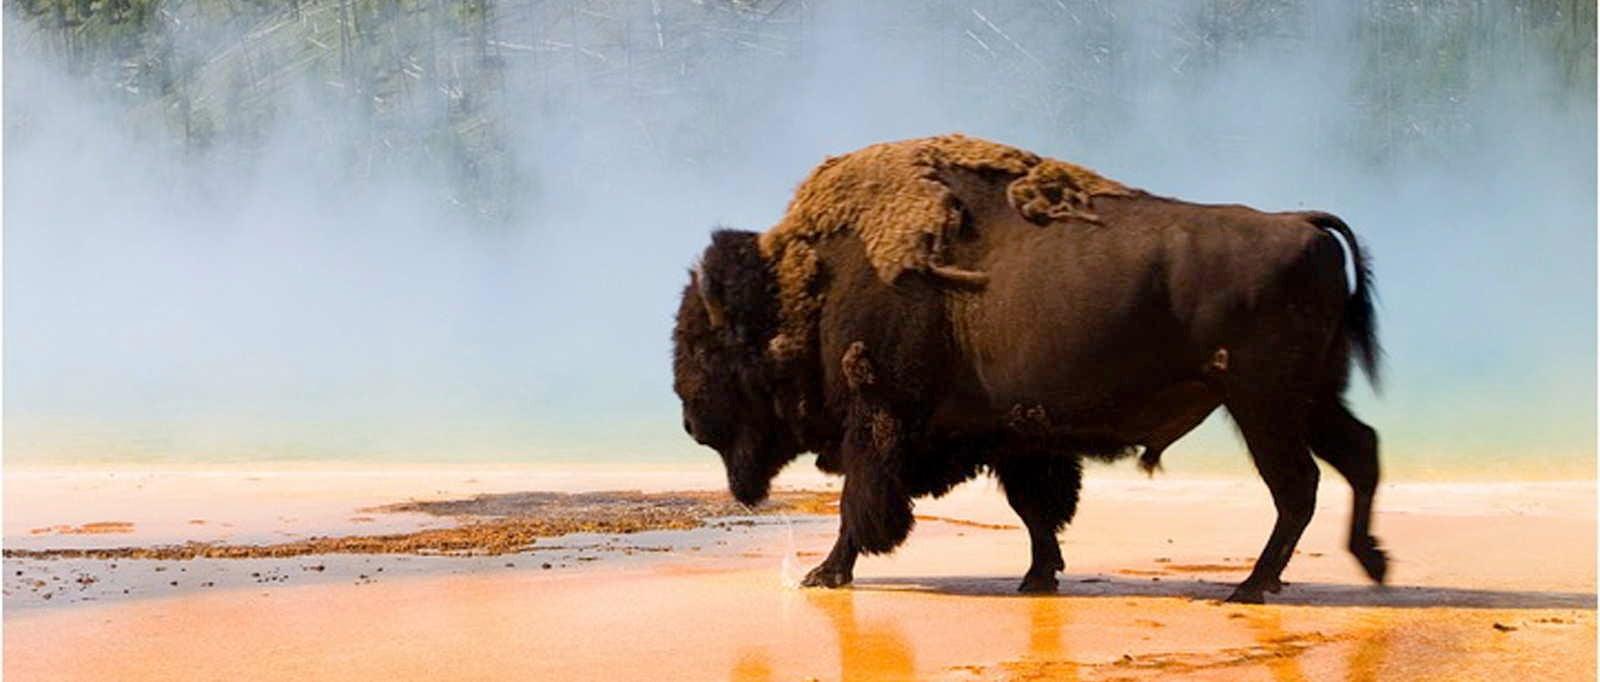 Buffalo in Yellowstone National Park, Wyoming, USA